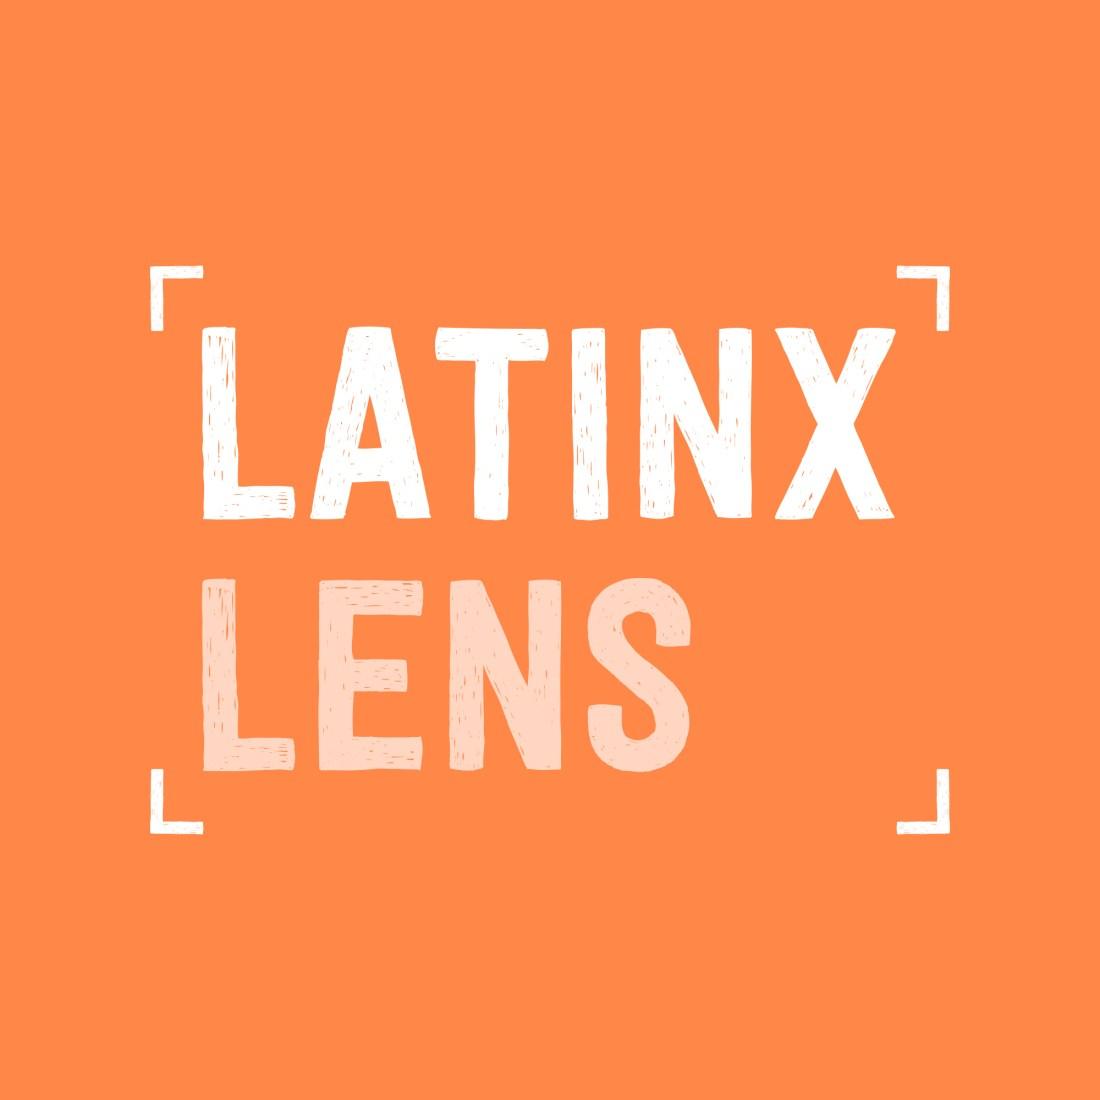 LatinxLens